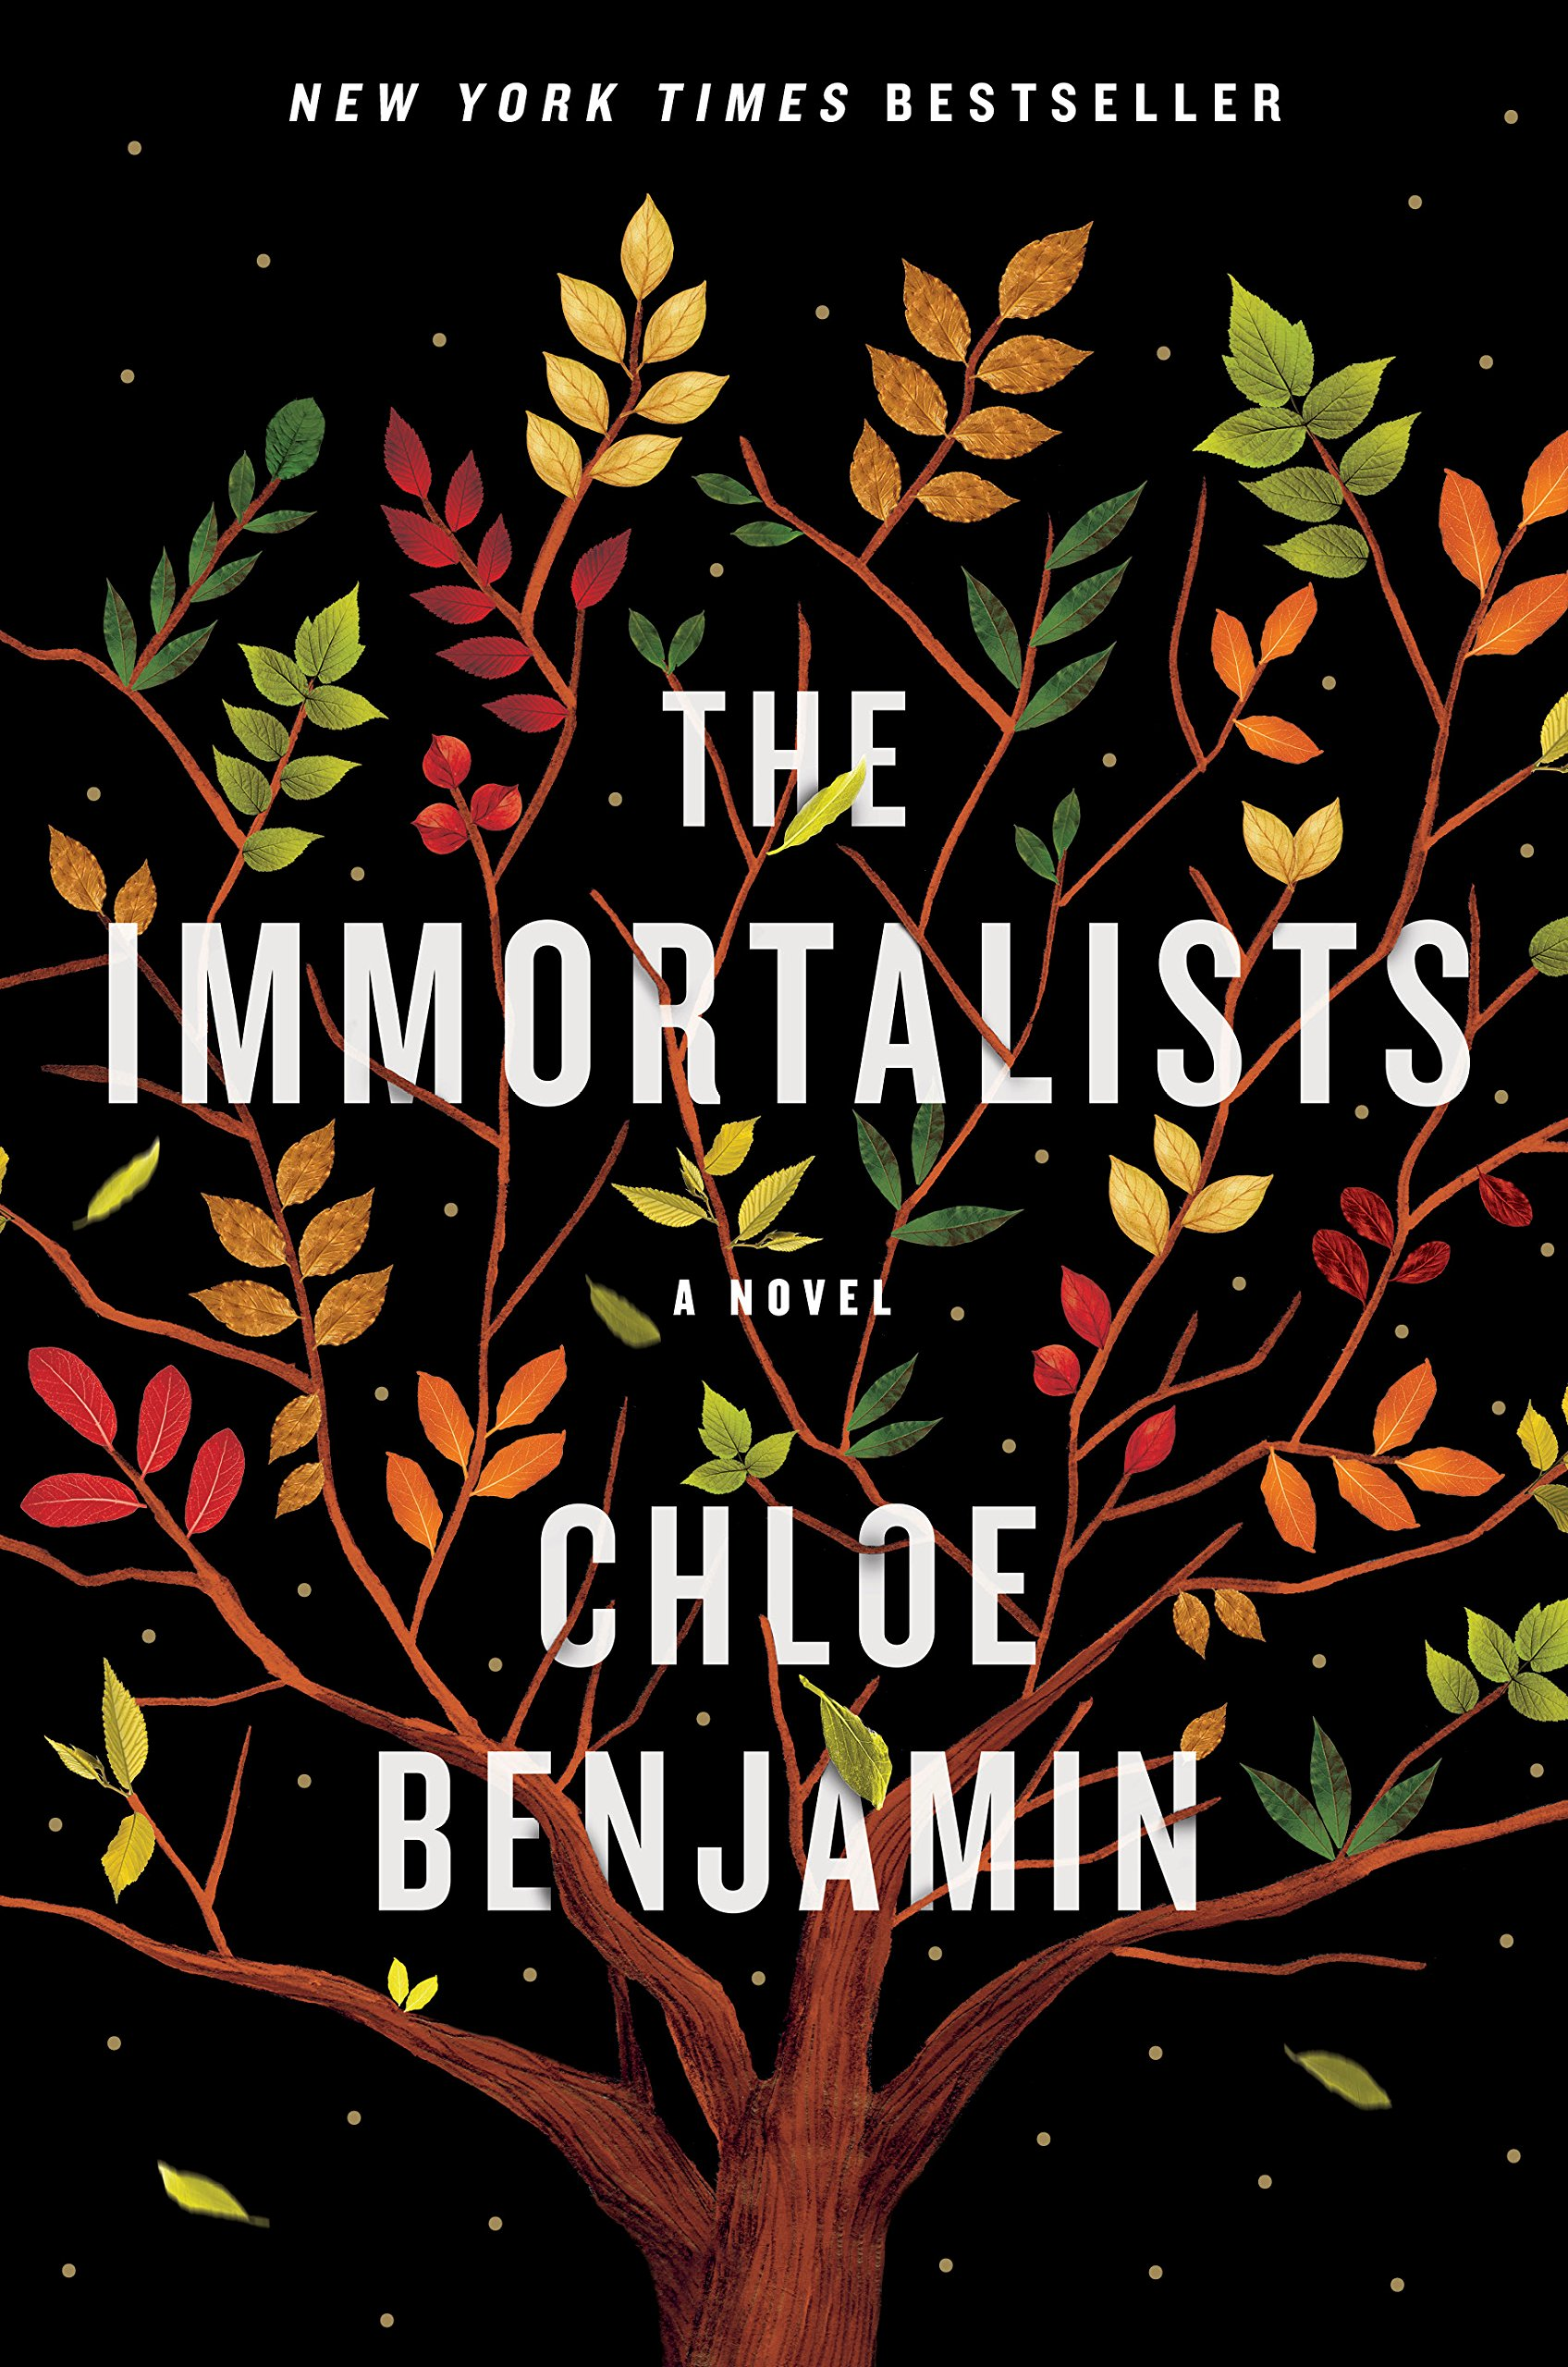 the immortalists by chloe benjamin.jpg